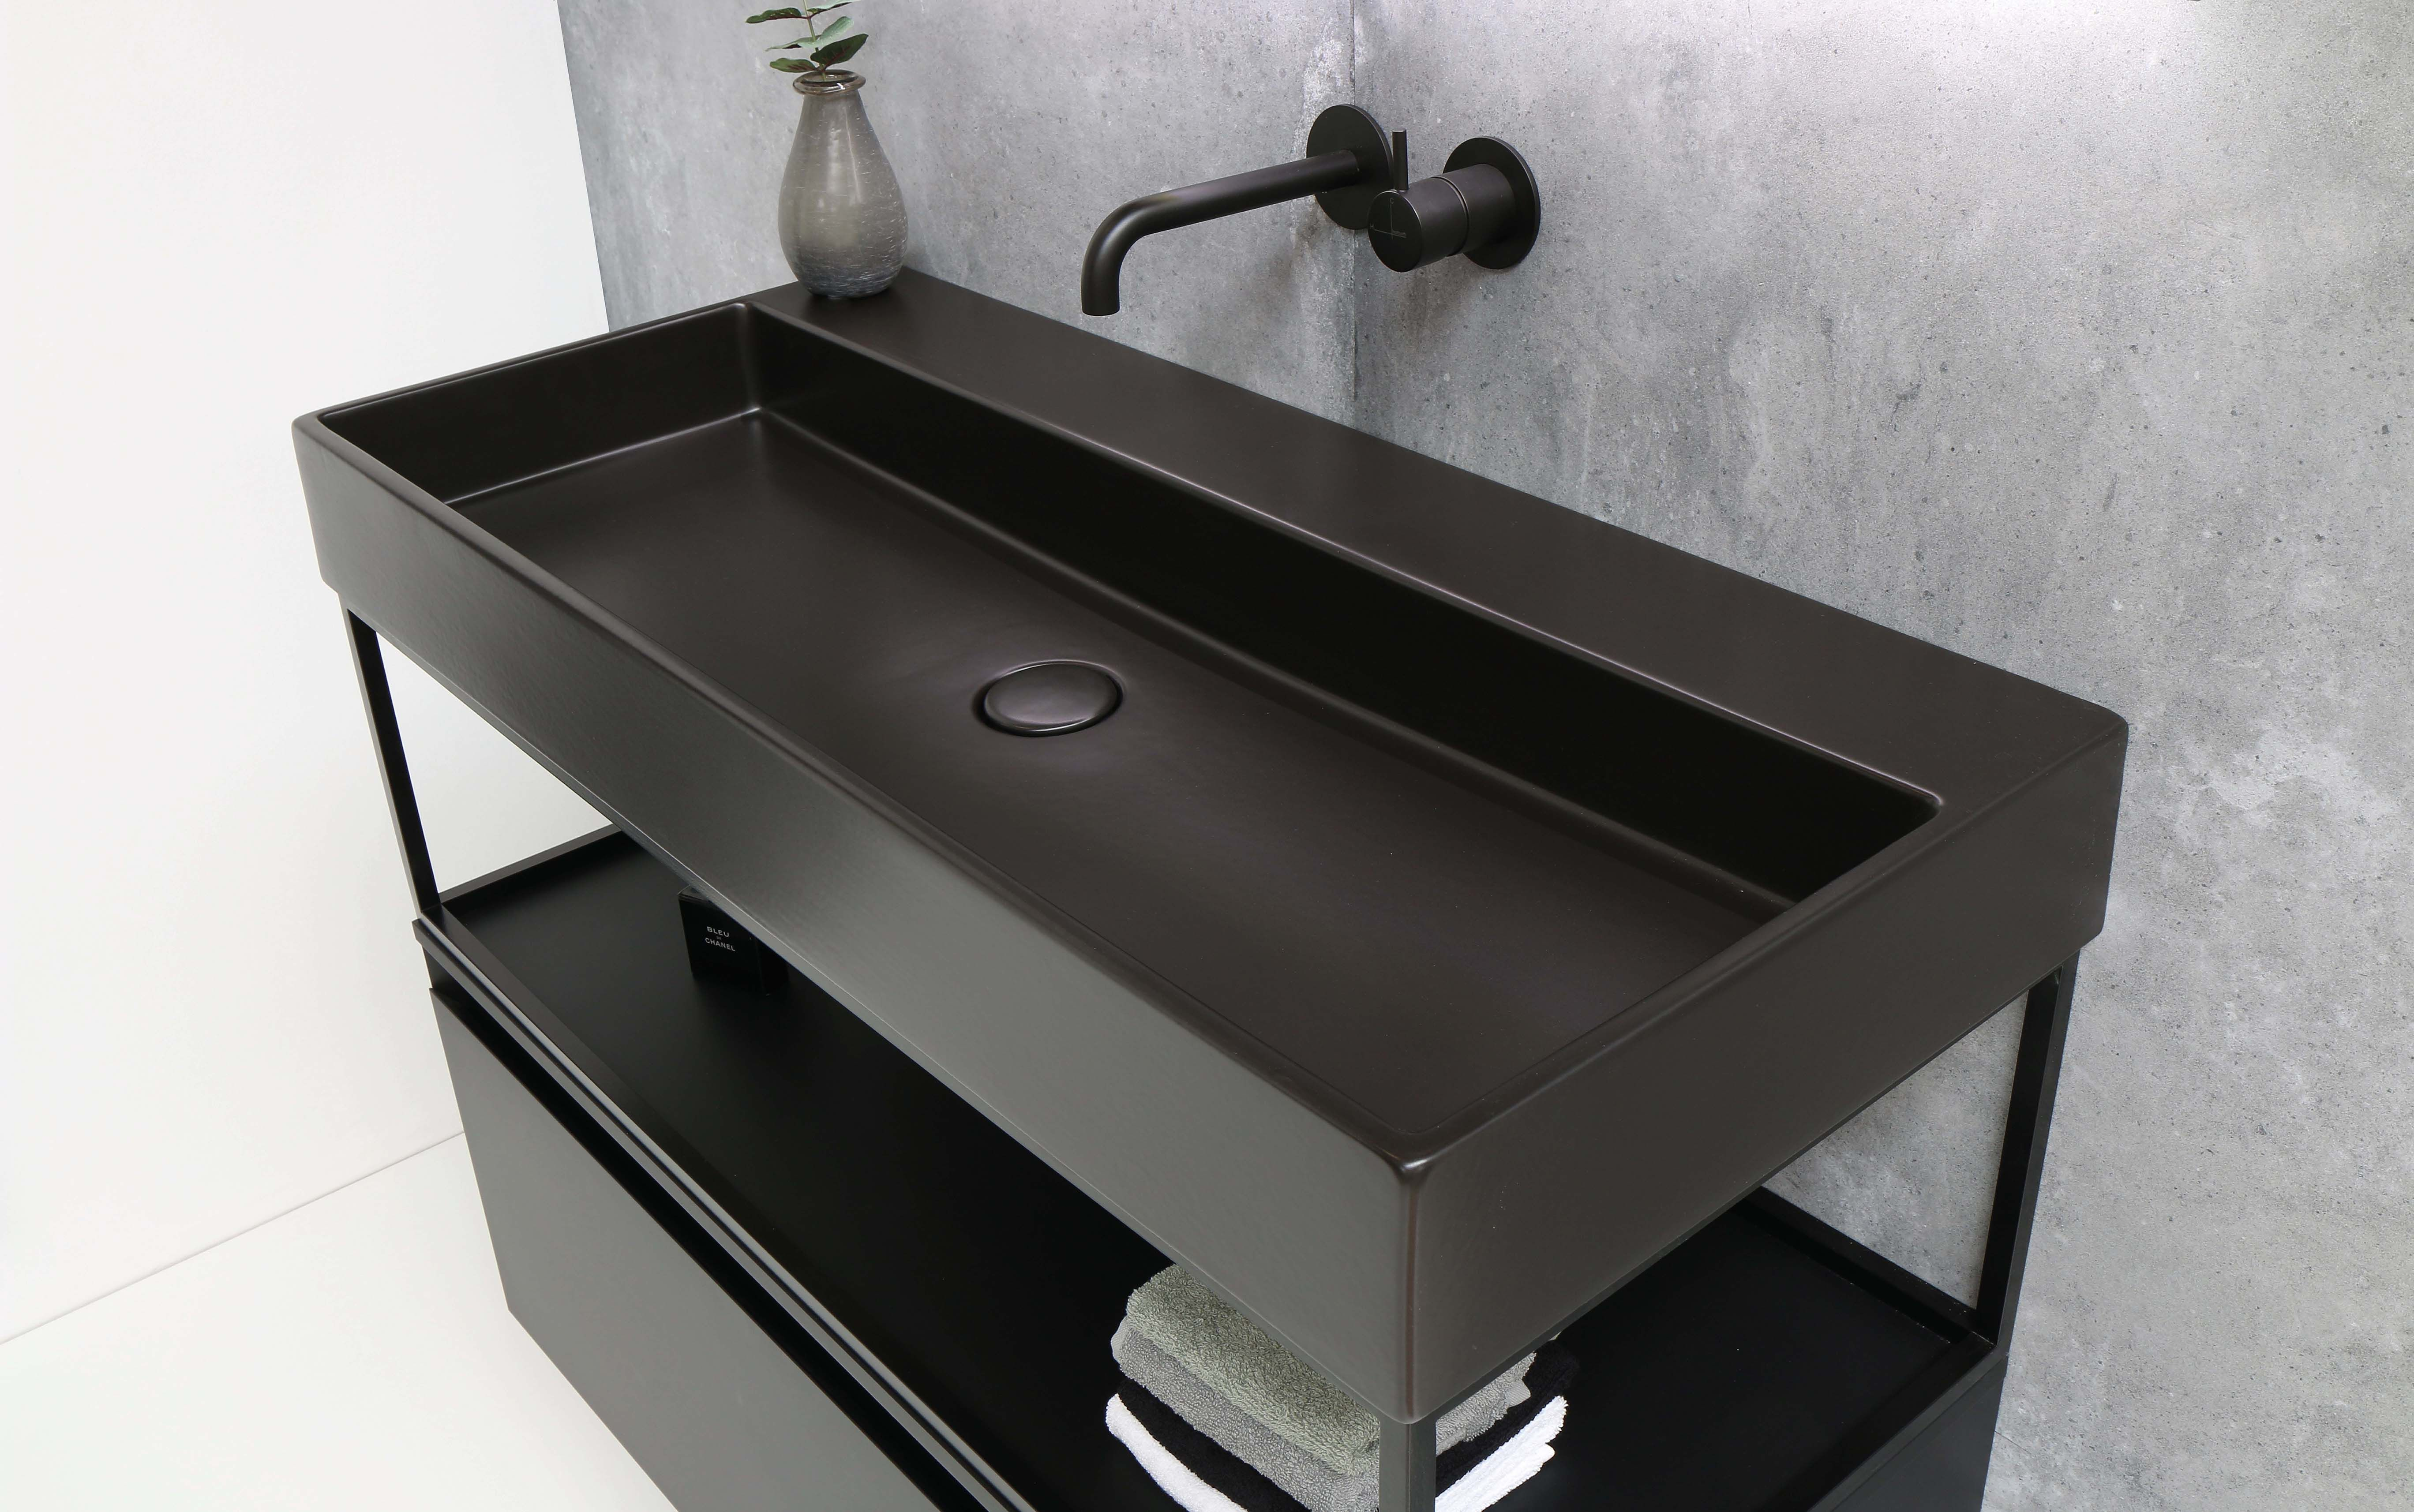 Dubbele wastafel 100 x 40 mooi wastafel 100 badkamermeubels Ink united mat zwart 100 cm ferro frame 100 cm onderkast enkele